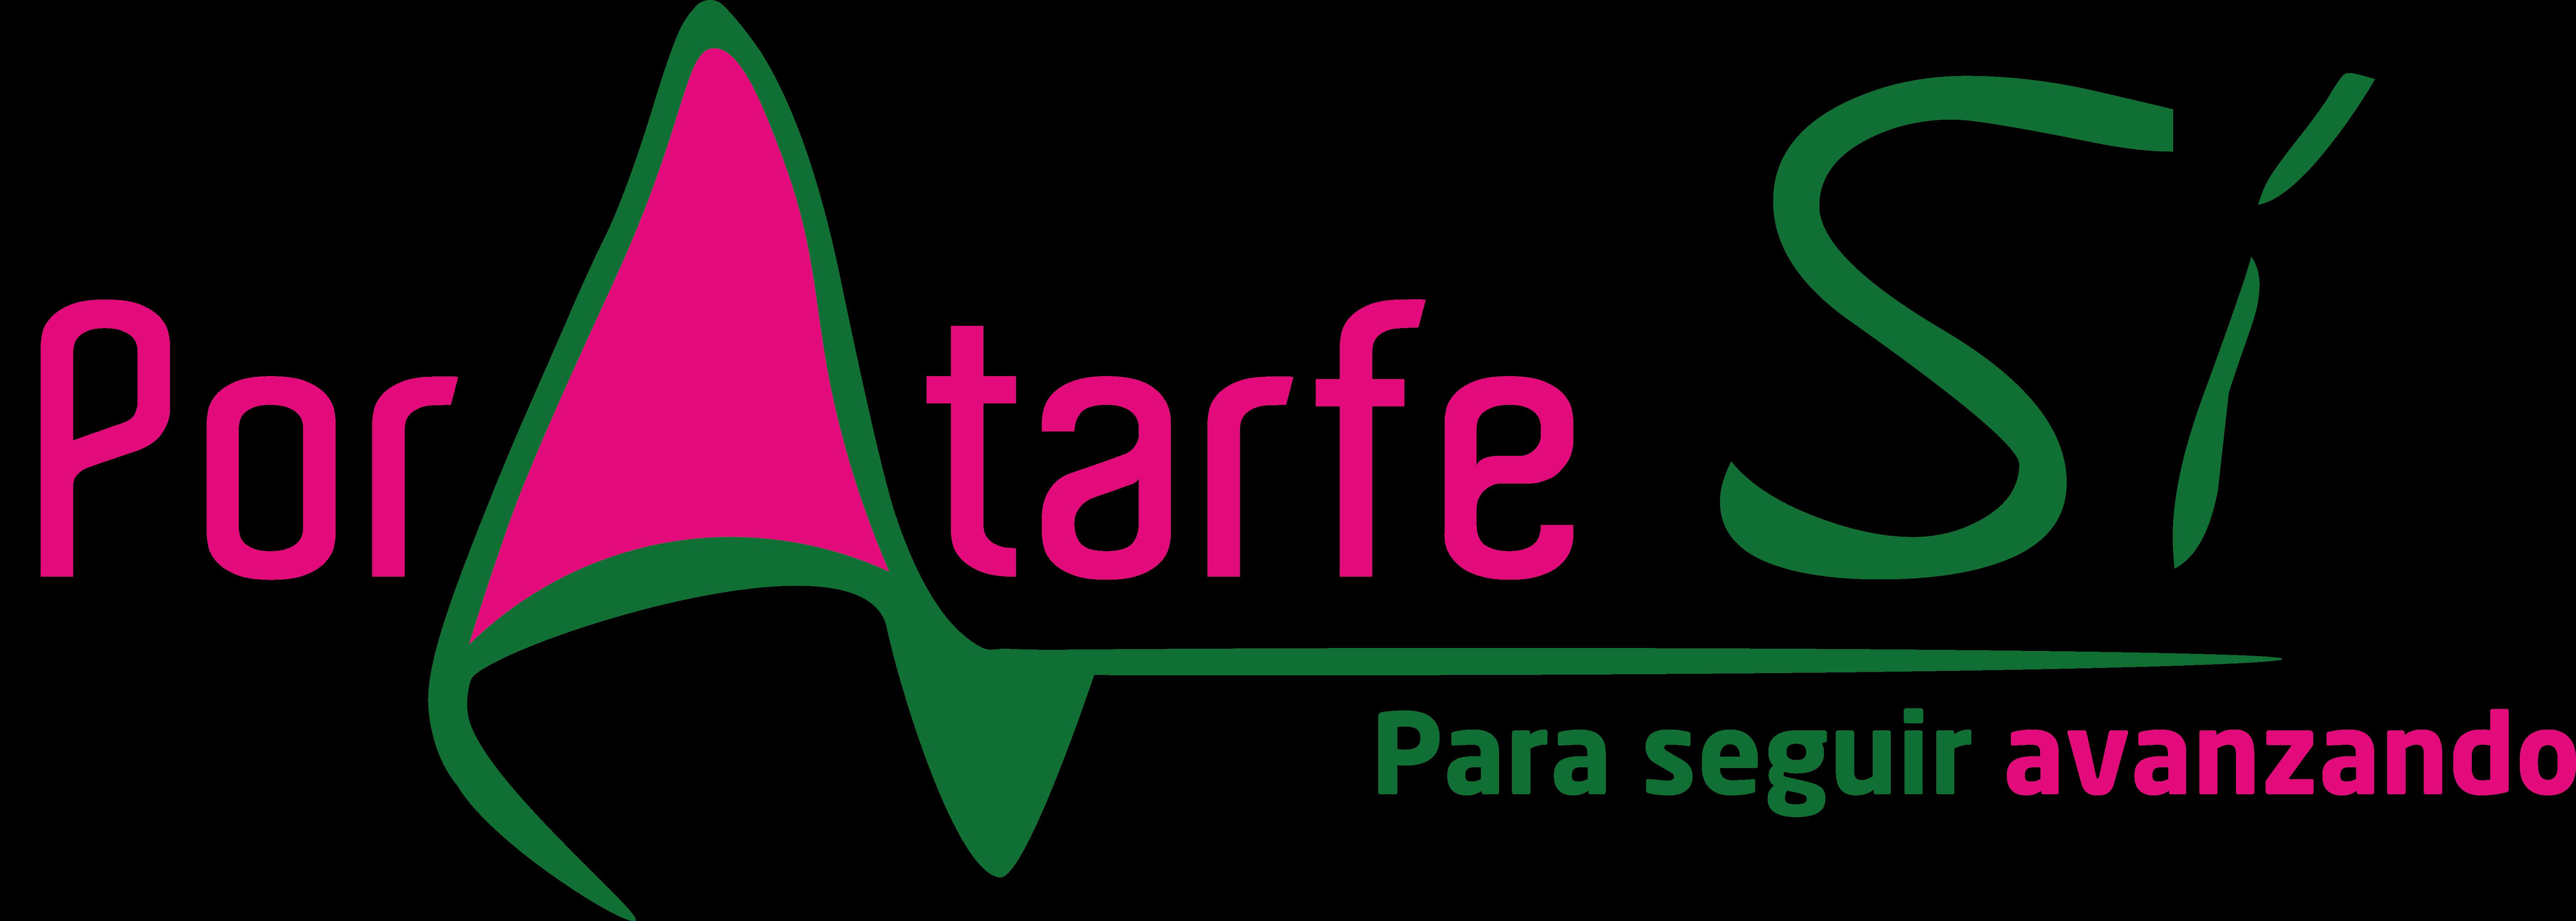 Por Atarfe Sí – Partido político local de Atarfe